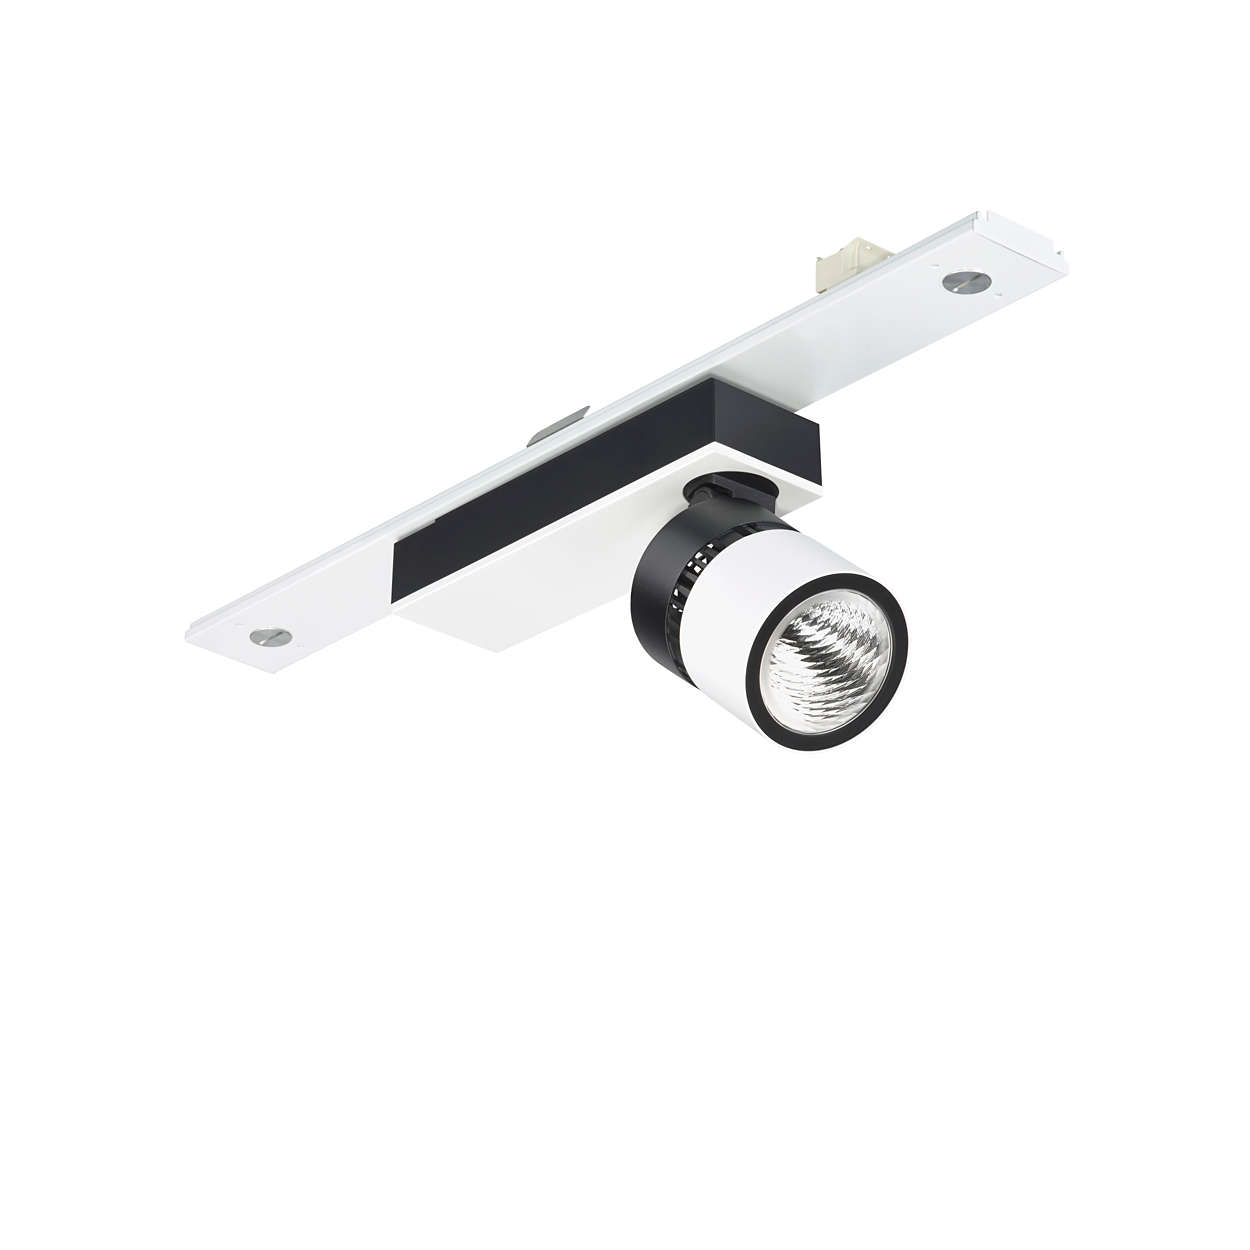 Maxos LED Spot Inserts — гибкость и стиль